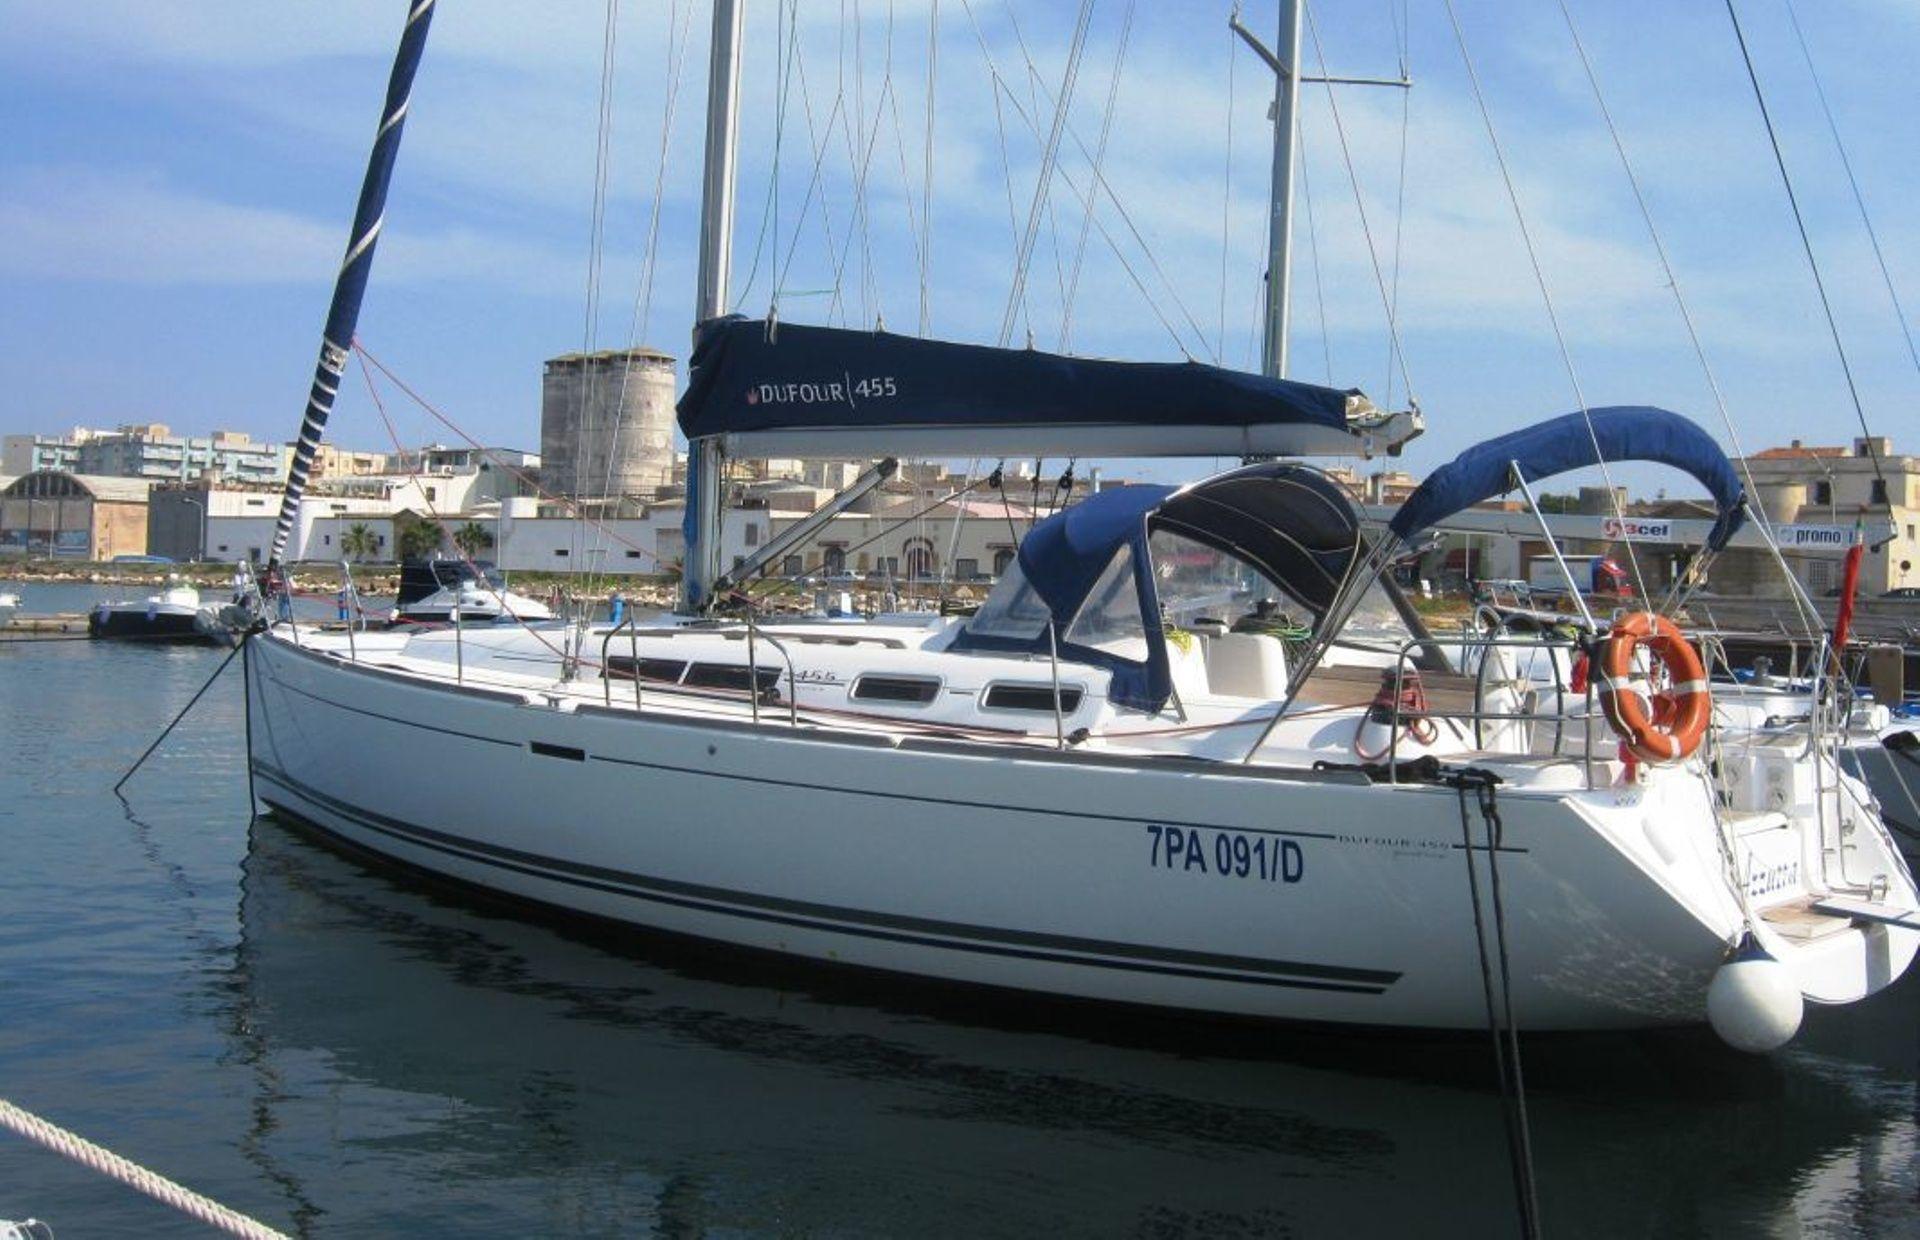 https://media.insailing.com/boat/dufour-455/image_1576069514166.jpg